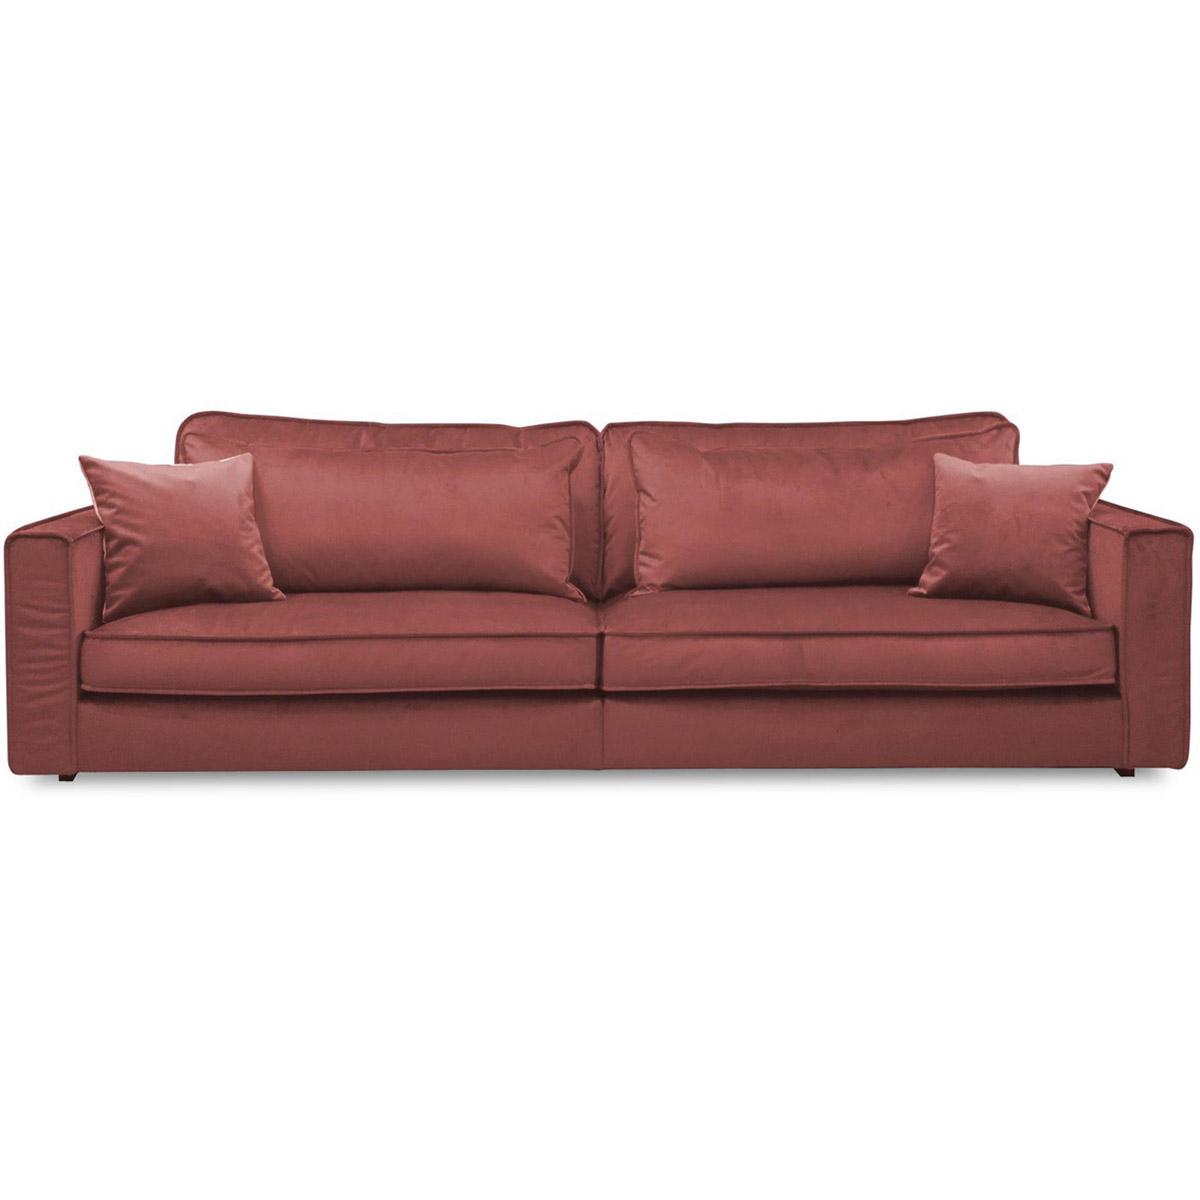 Luca-soffa-fasta-ryggkuddar